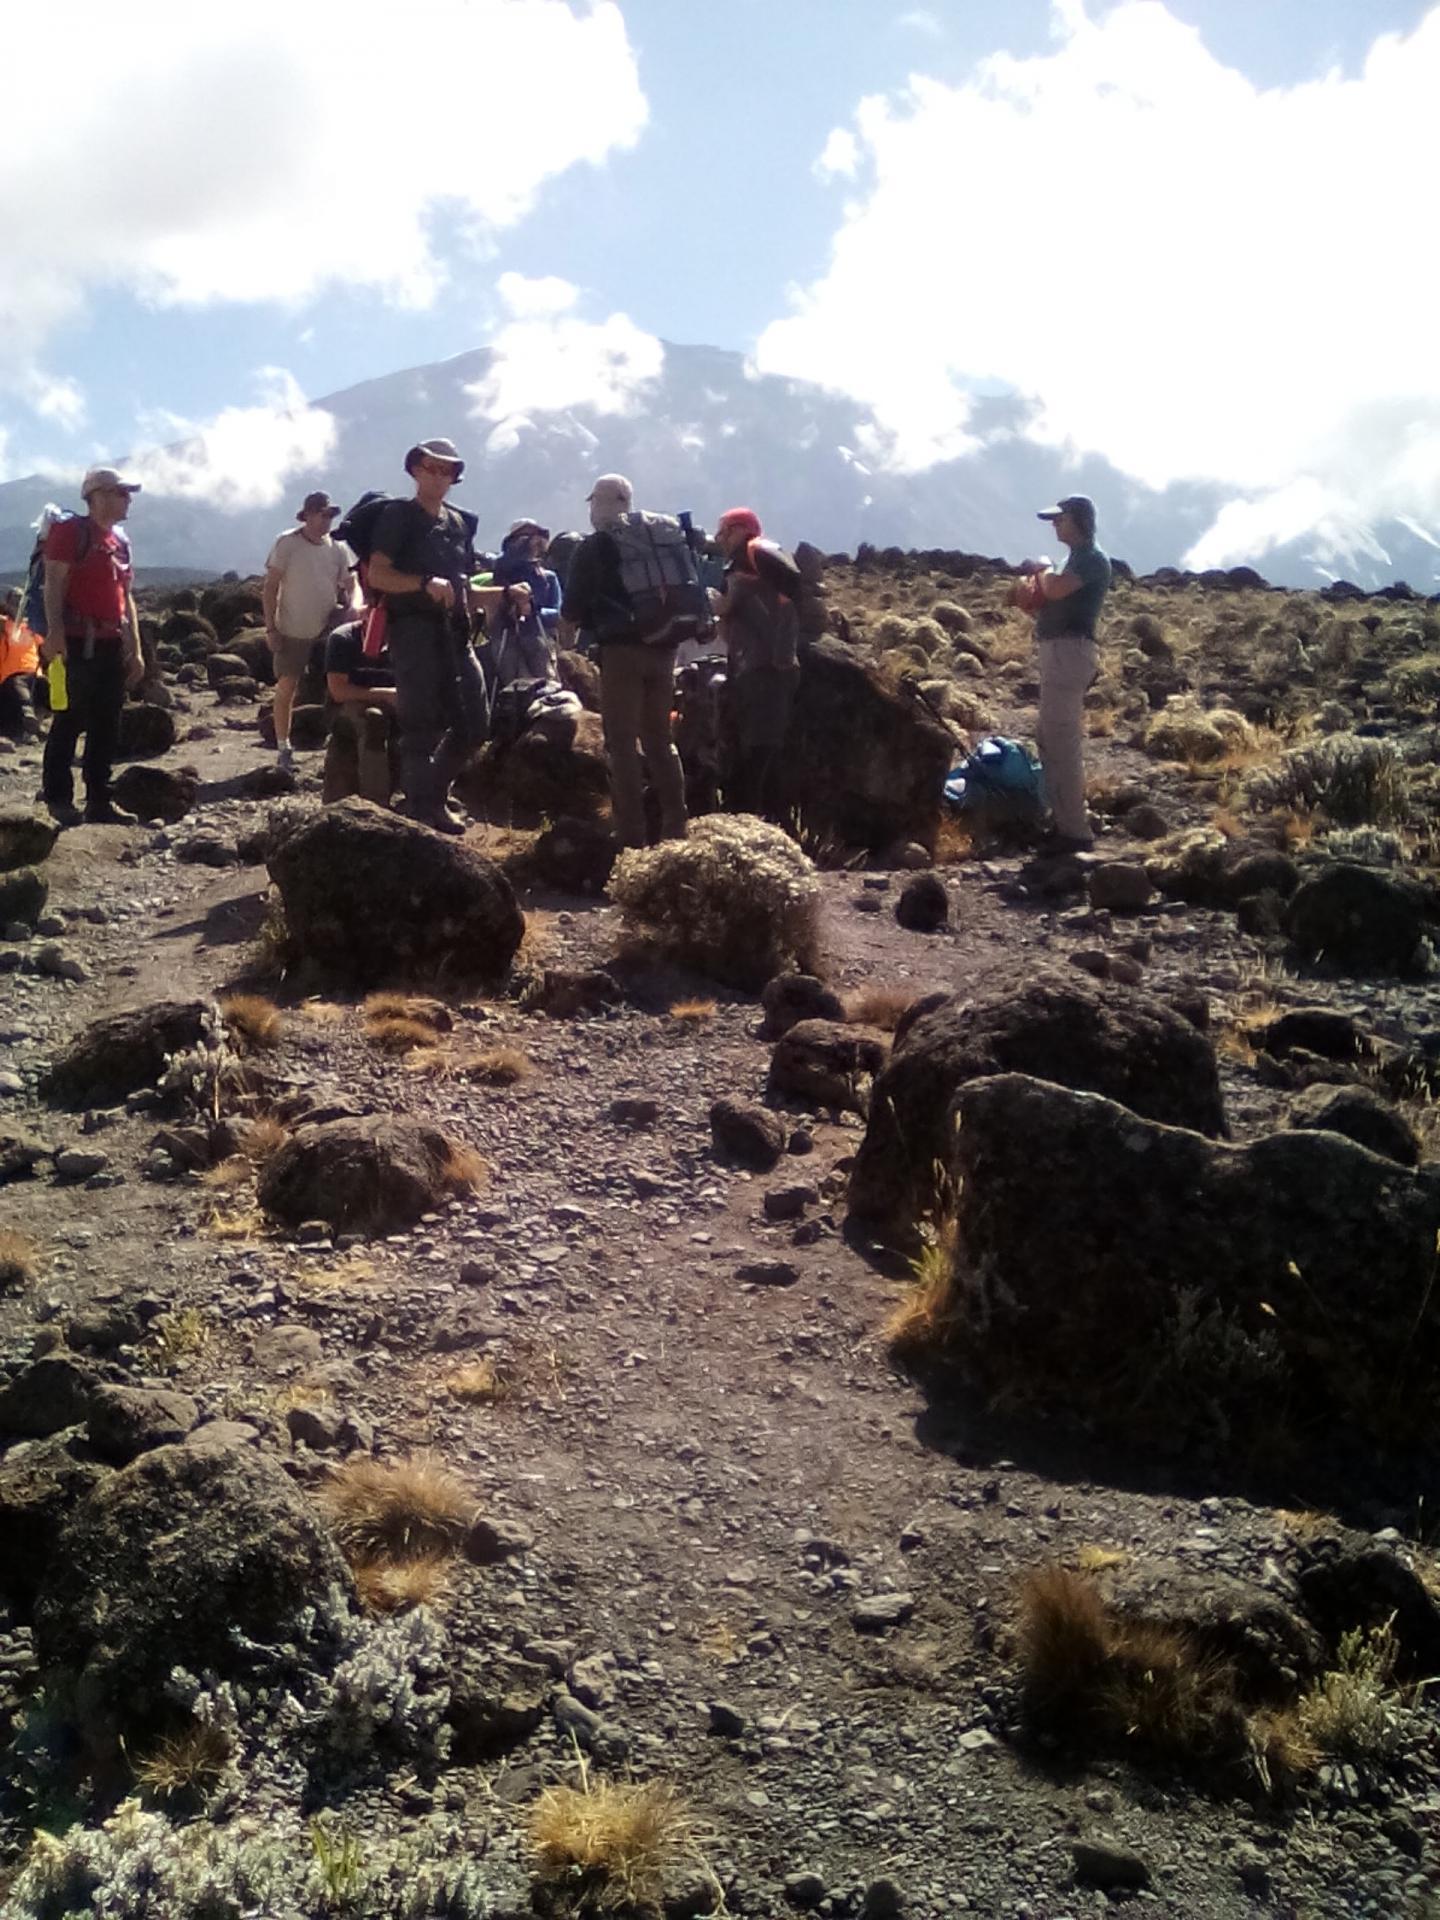 Kilimanjaro, adventure climbing packages, trekking Mount Kilimanjaro, trek Kilimanjaro, climbing mount Kilimanjaro